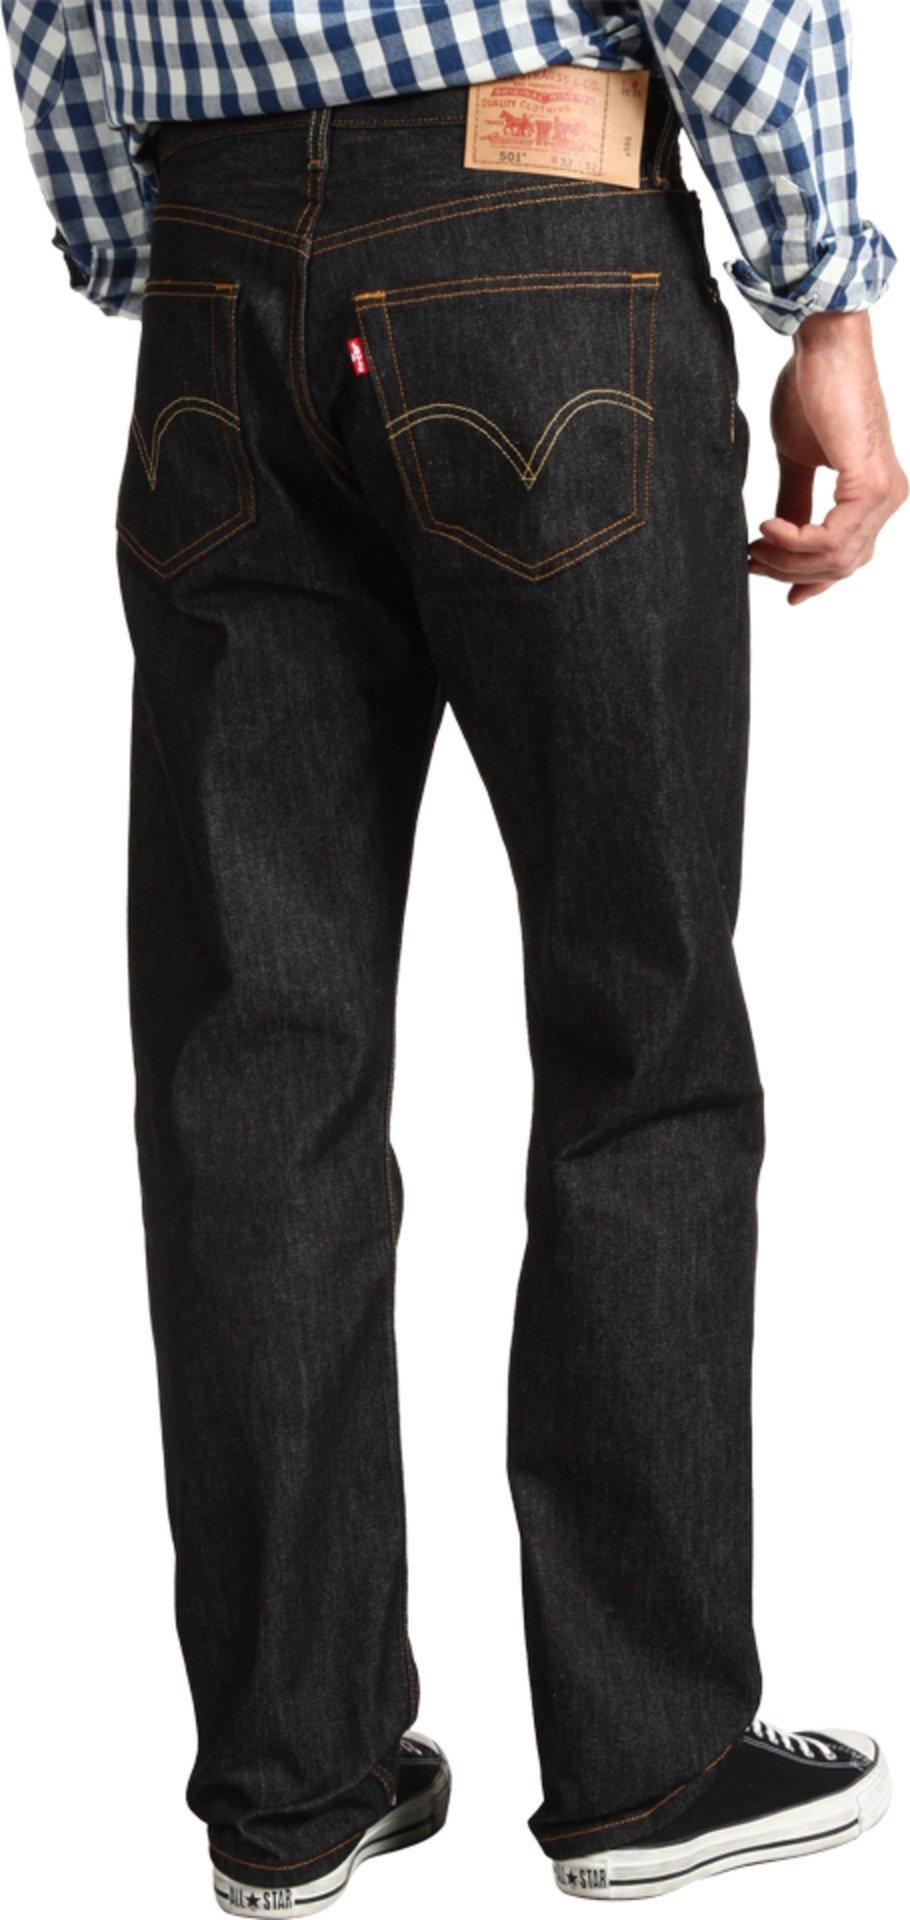 Levi's Men's 501 Original Shrink-to-Fit Jeans,  Black STF, 30WX32L